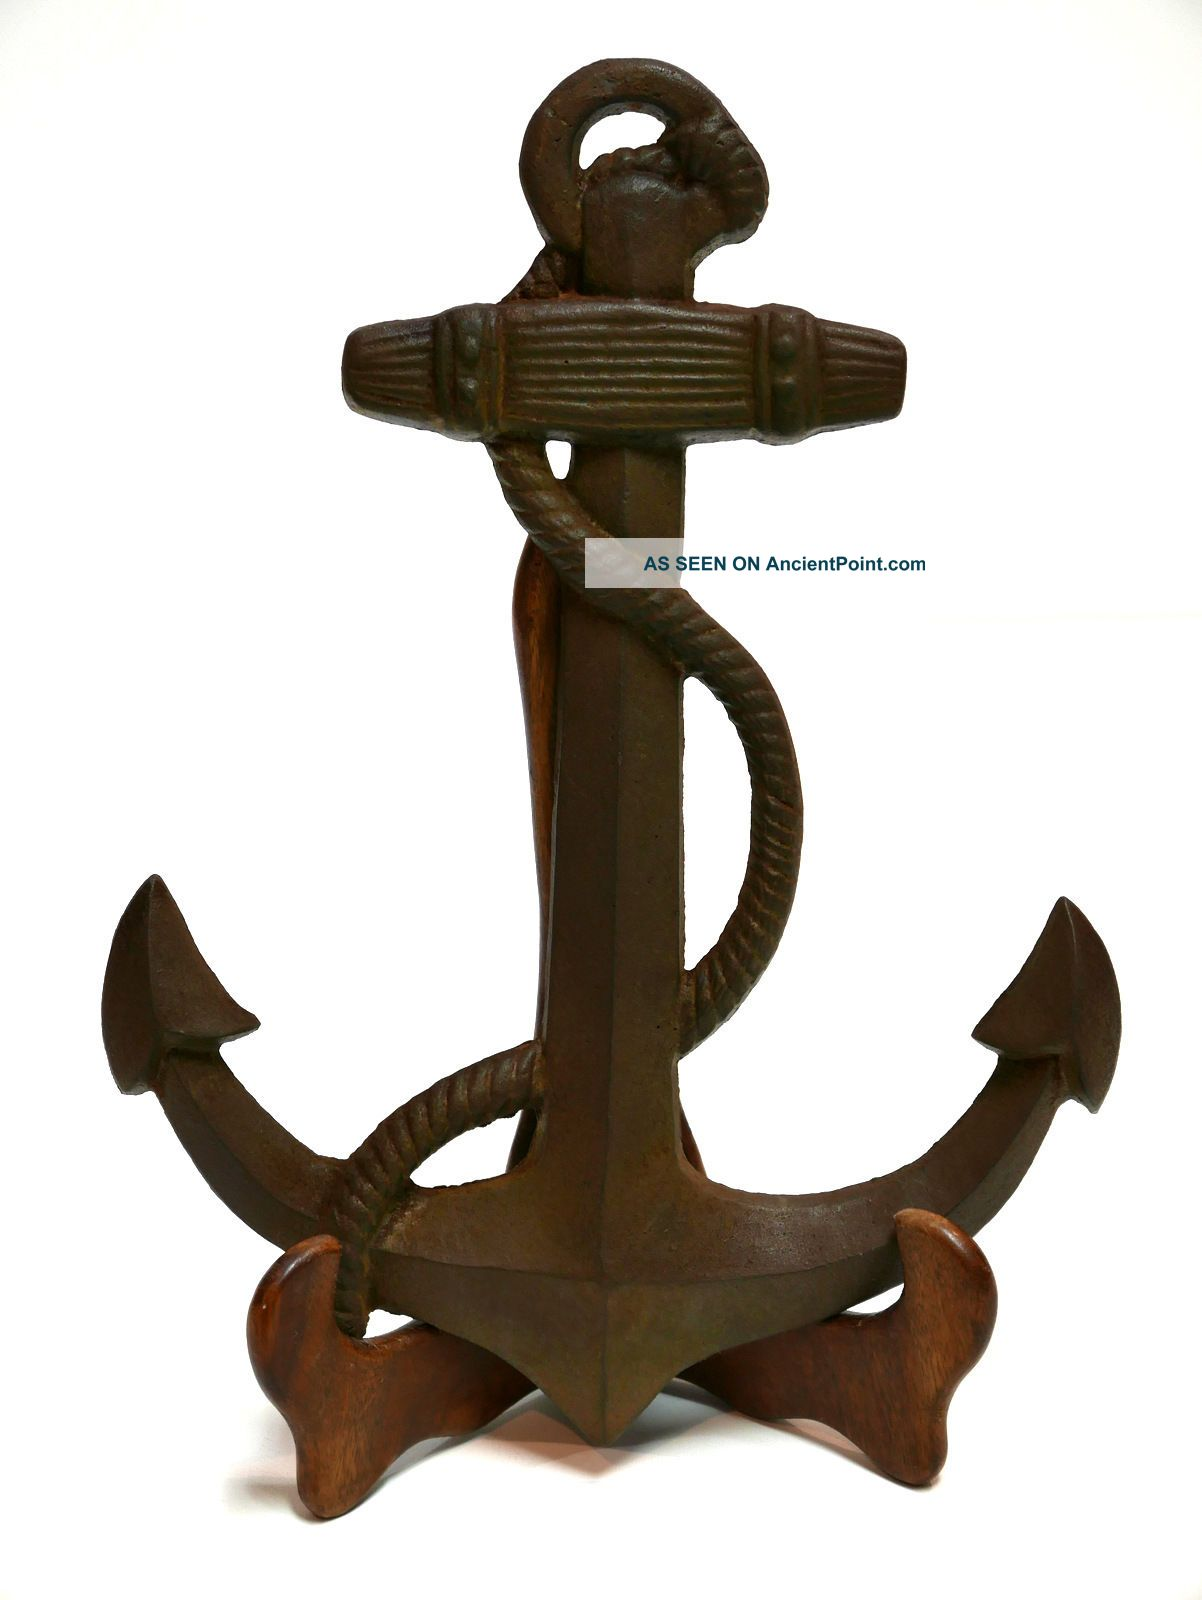 Rustic Ship Iron Anchor Decorative Wall Yard Art Nautical